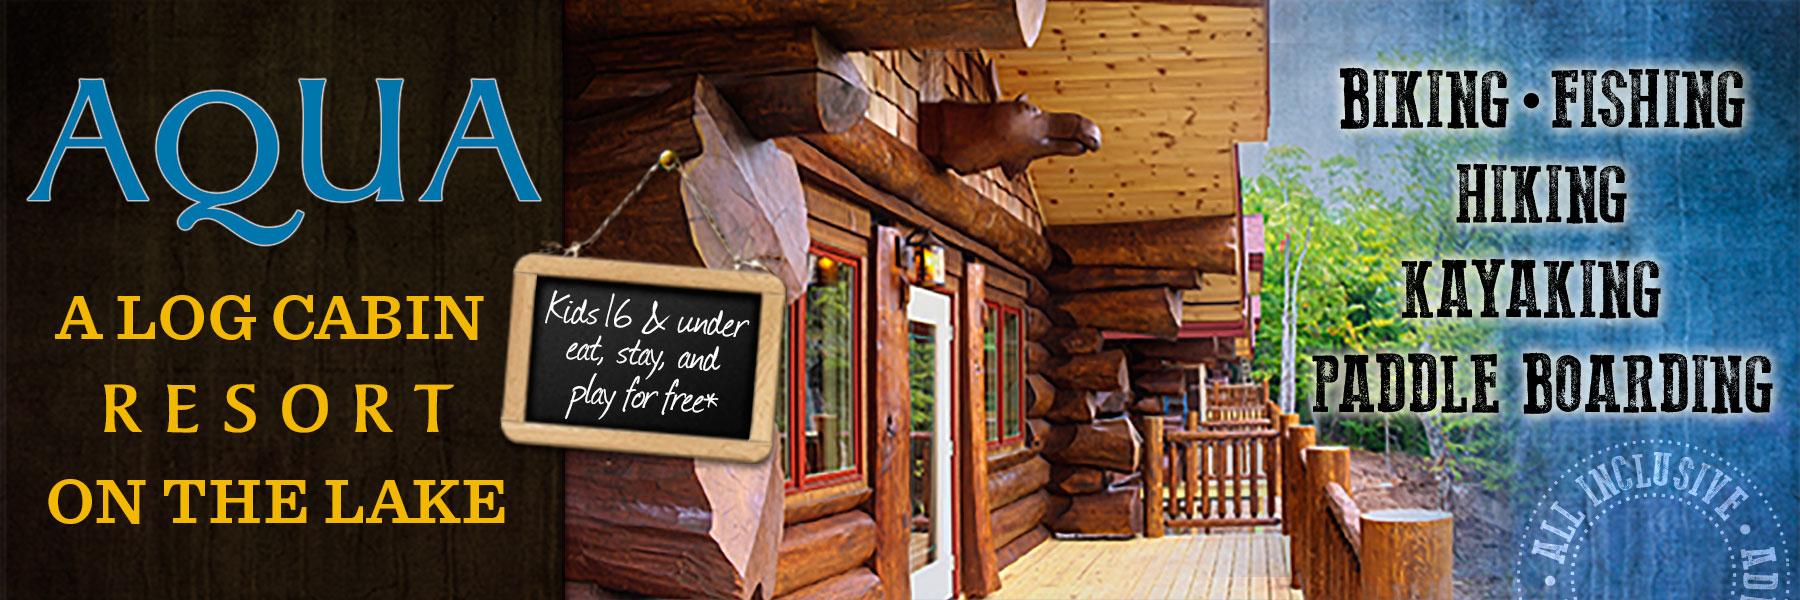 aqua log cabin resort